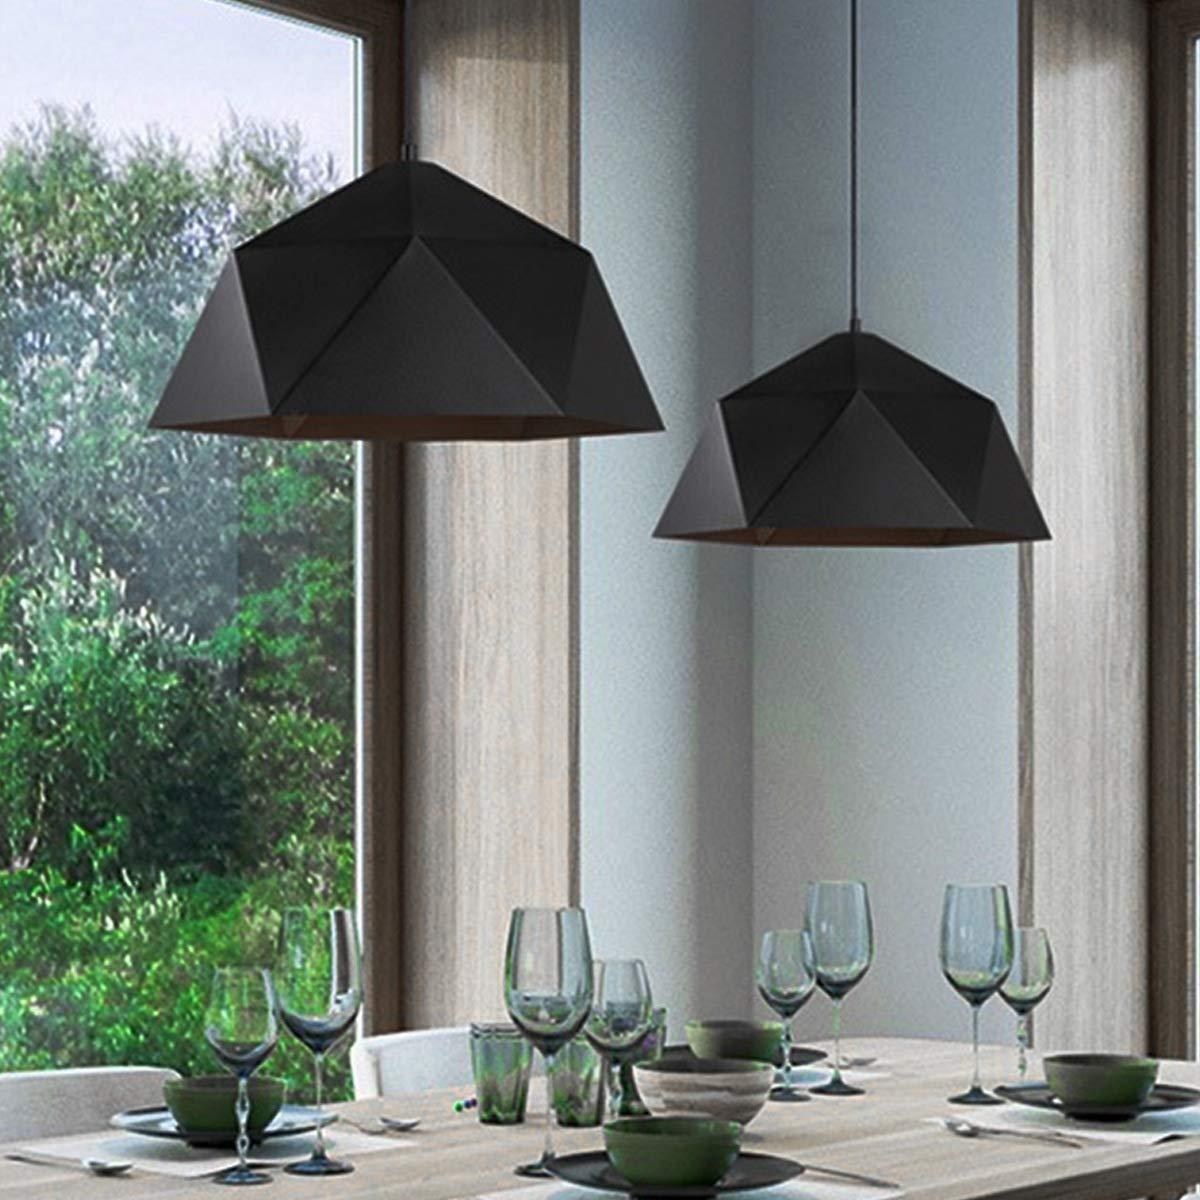 NANGE Wrought Iron Diamond Pendant Lamp, Industrial Wind Ancient Ways Geometry Pot Droplight,Cafe Restaurant Chandelier,E27(Without Light Source) (Color : Black, Size : AC 110V) by NANGE (Image #4)